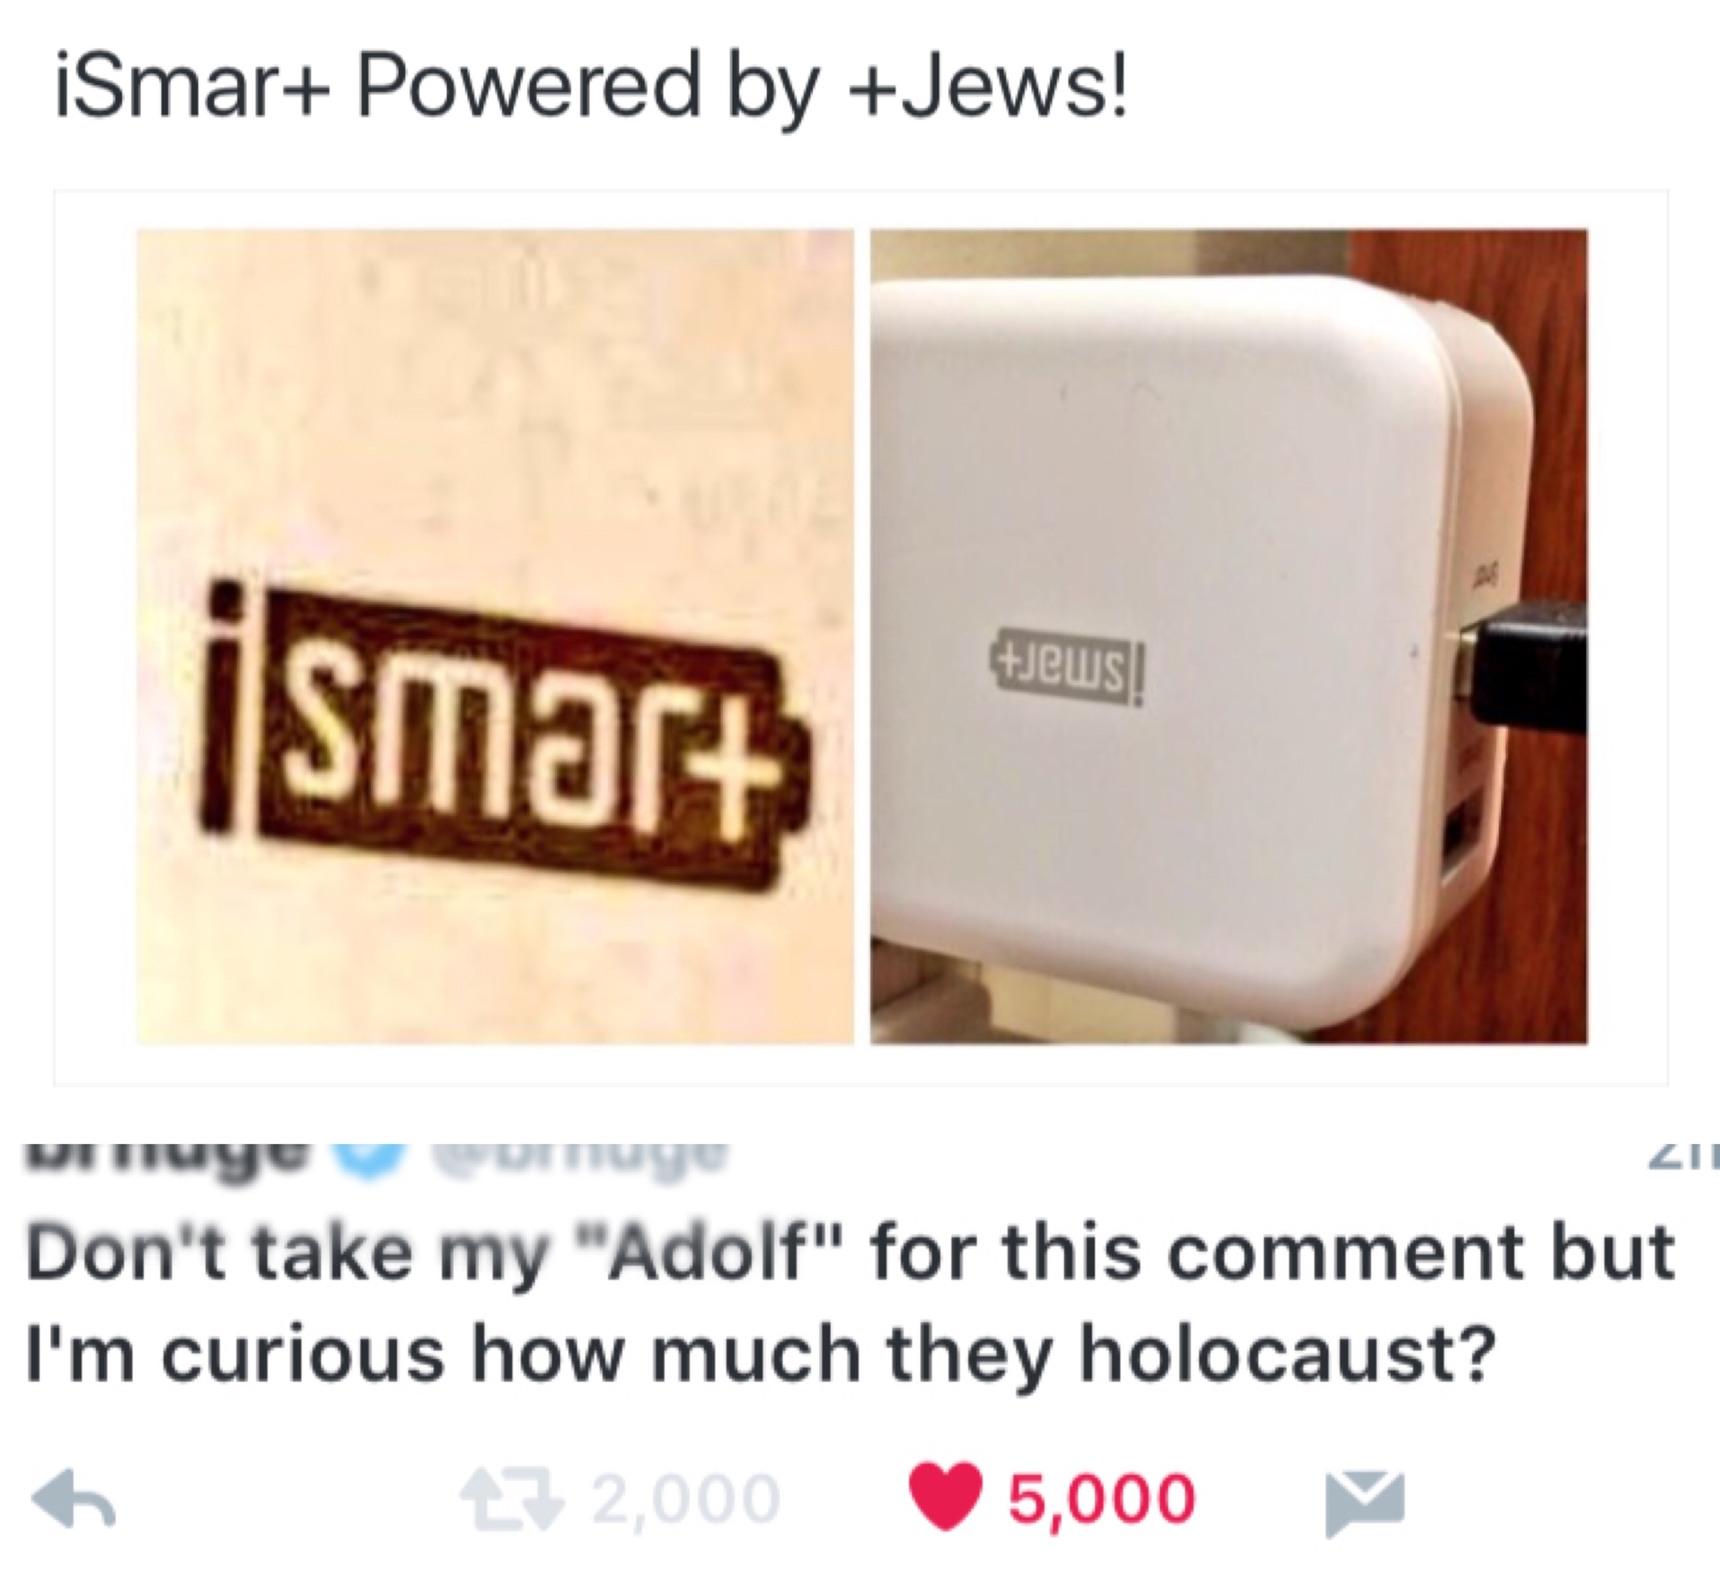 iSmart - meme